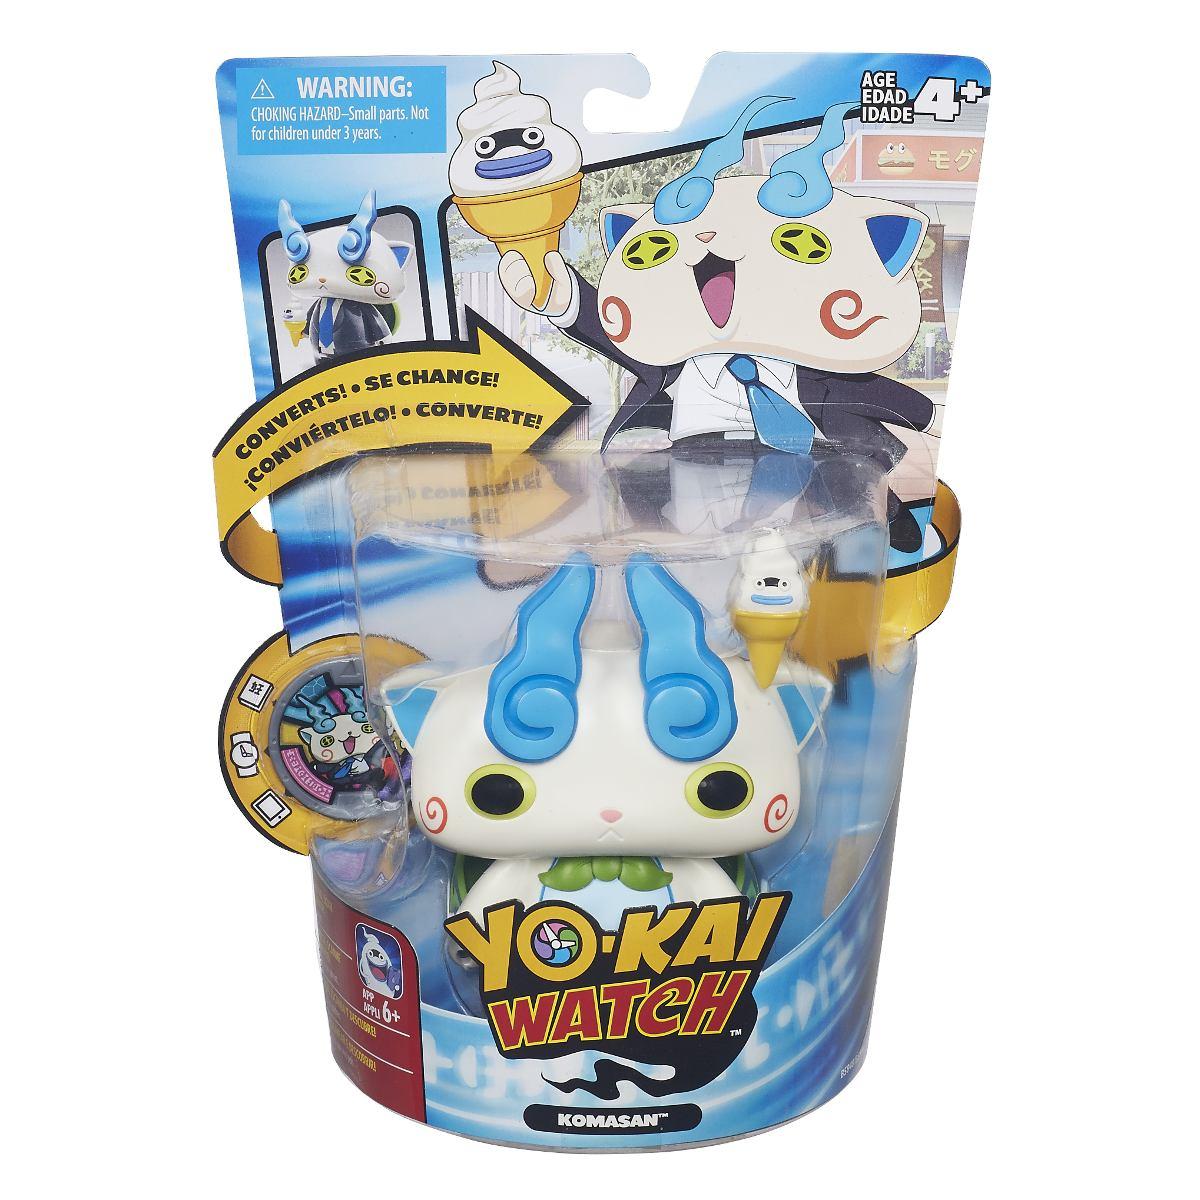 Boneco Yo-kai Watch Komasan Transformavel + Medalha - Hasbro